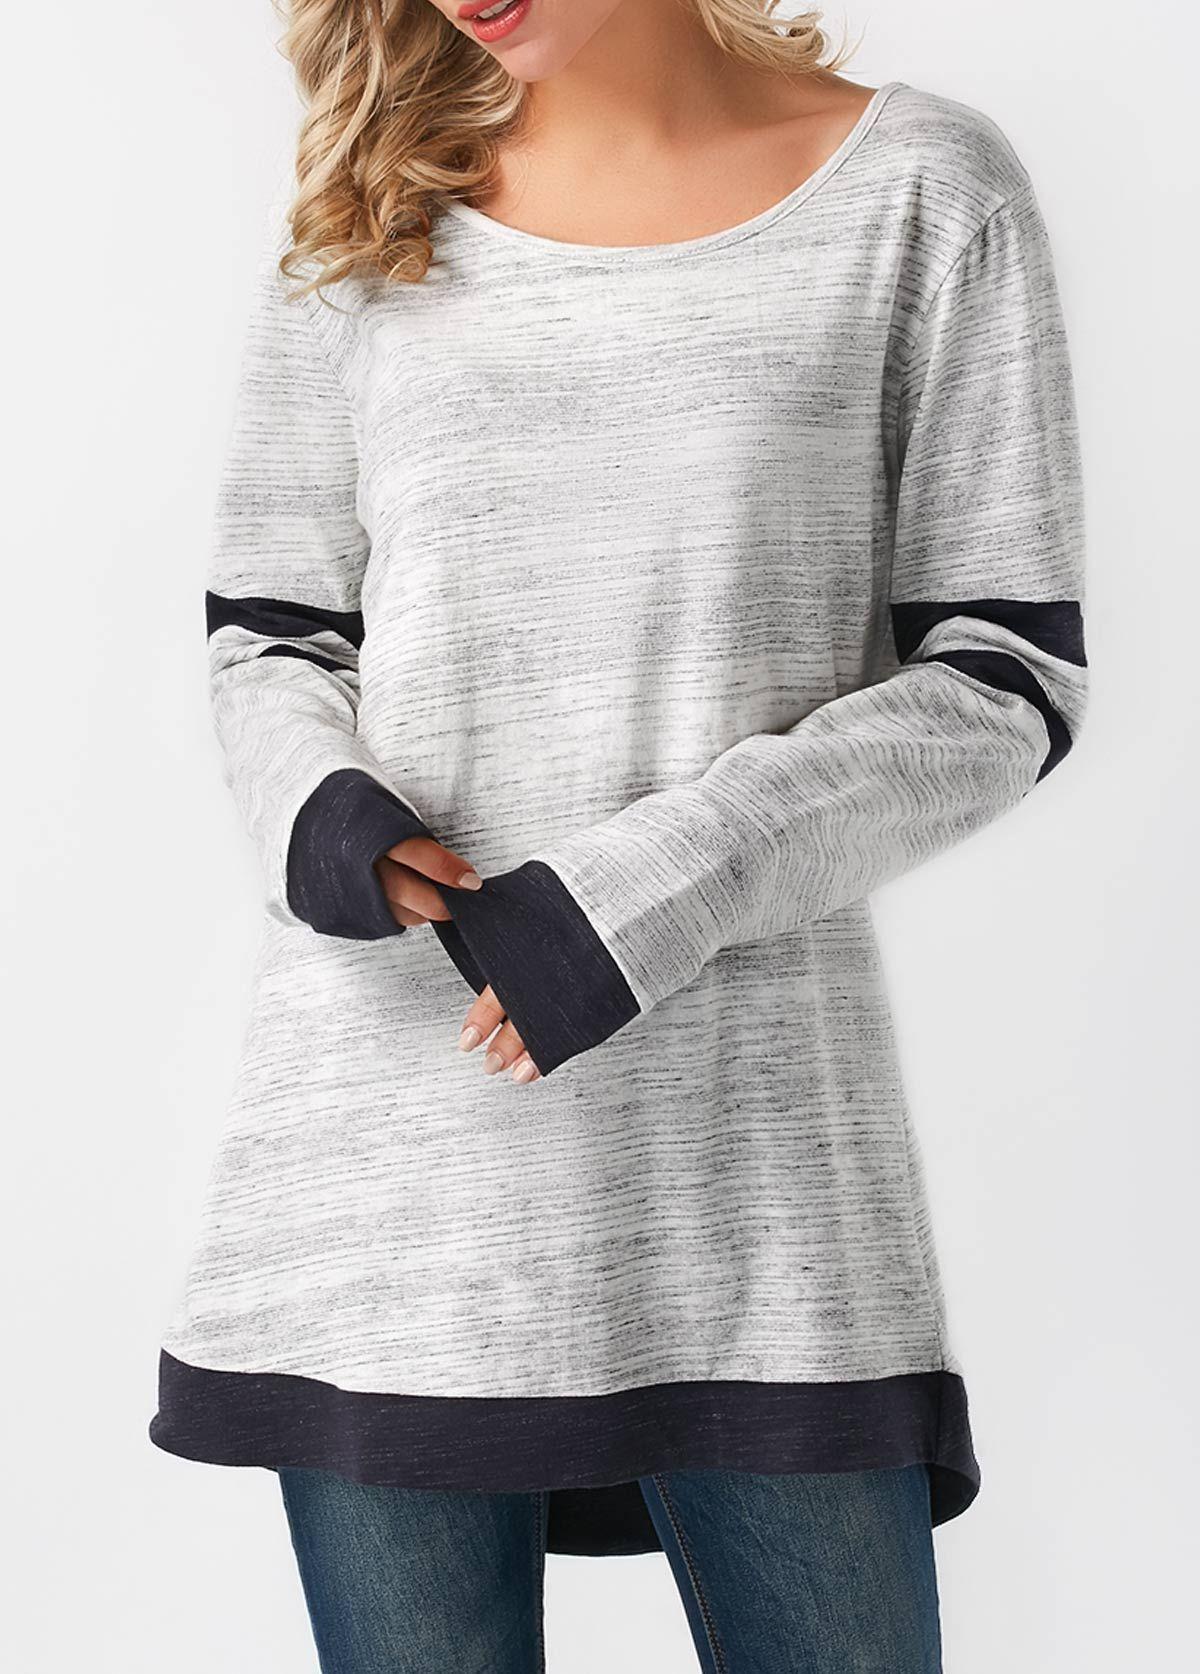 0e5d71ef3fc Grey Long Sleeve Asymmetric Hem T Shirt | Rotita.com - USD $28.42 ...